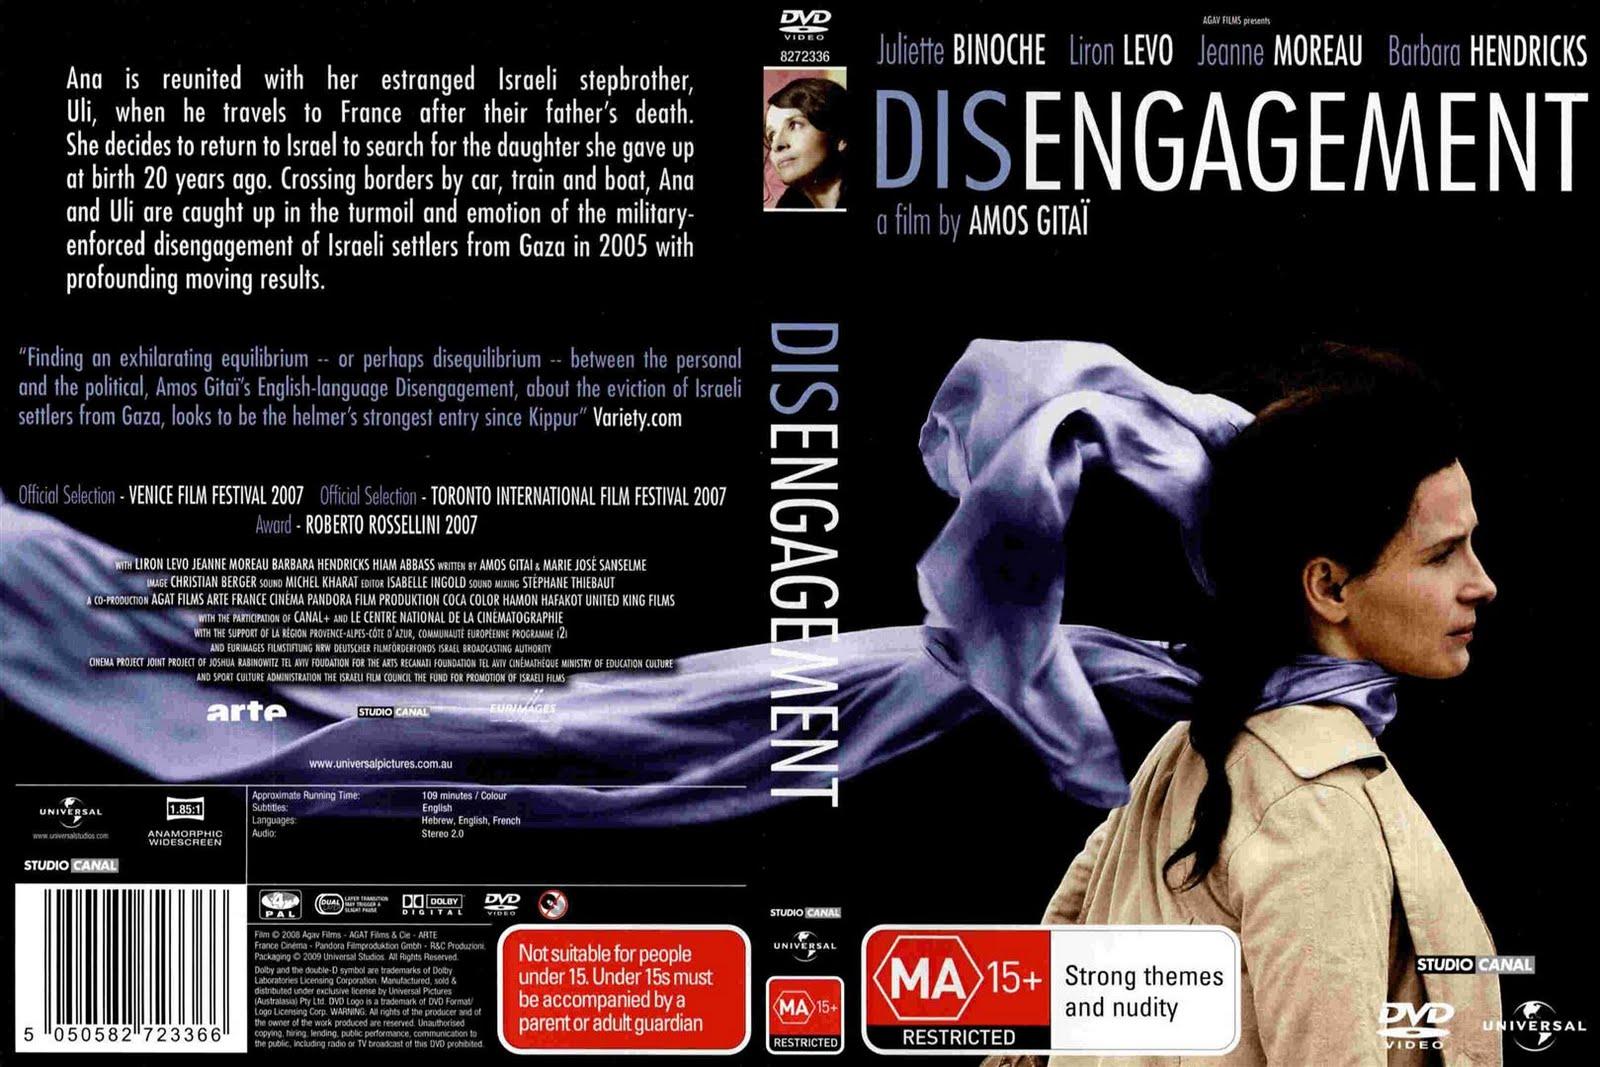 http://1.bp.blogspot.com/_mGkxudAo5eA/TQbQwonW9JI/AAAAAAAAD1s/itCB-Qk-4pk/s1600/Disengagement.jpg